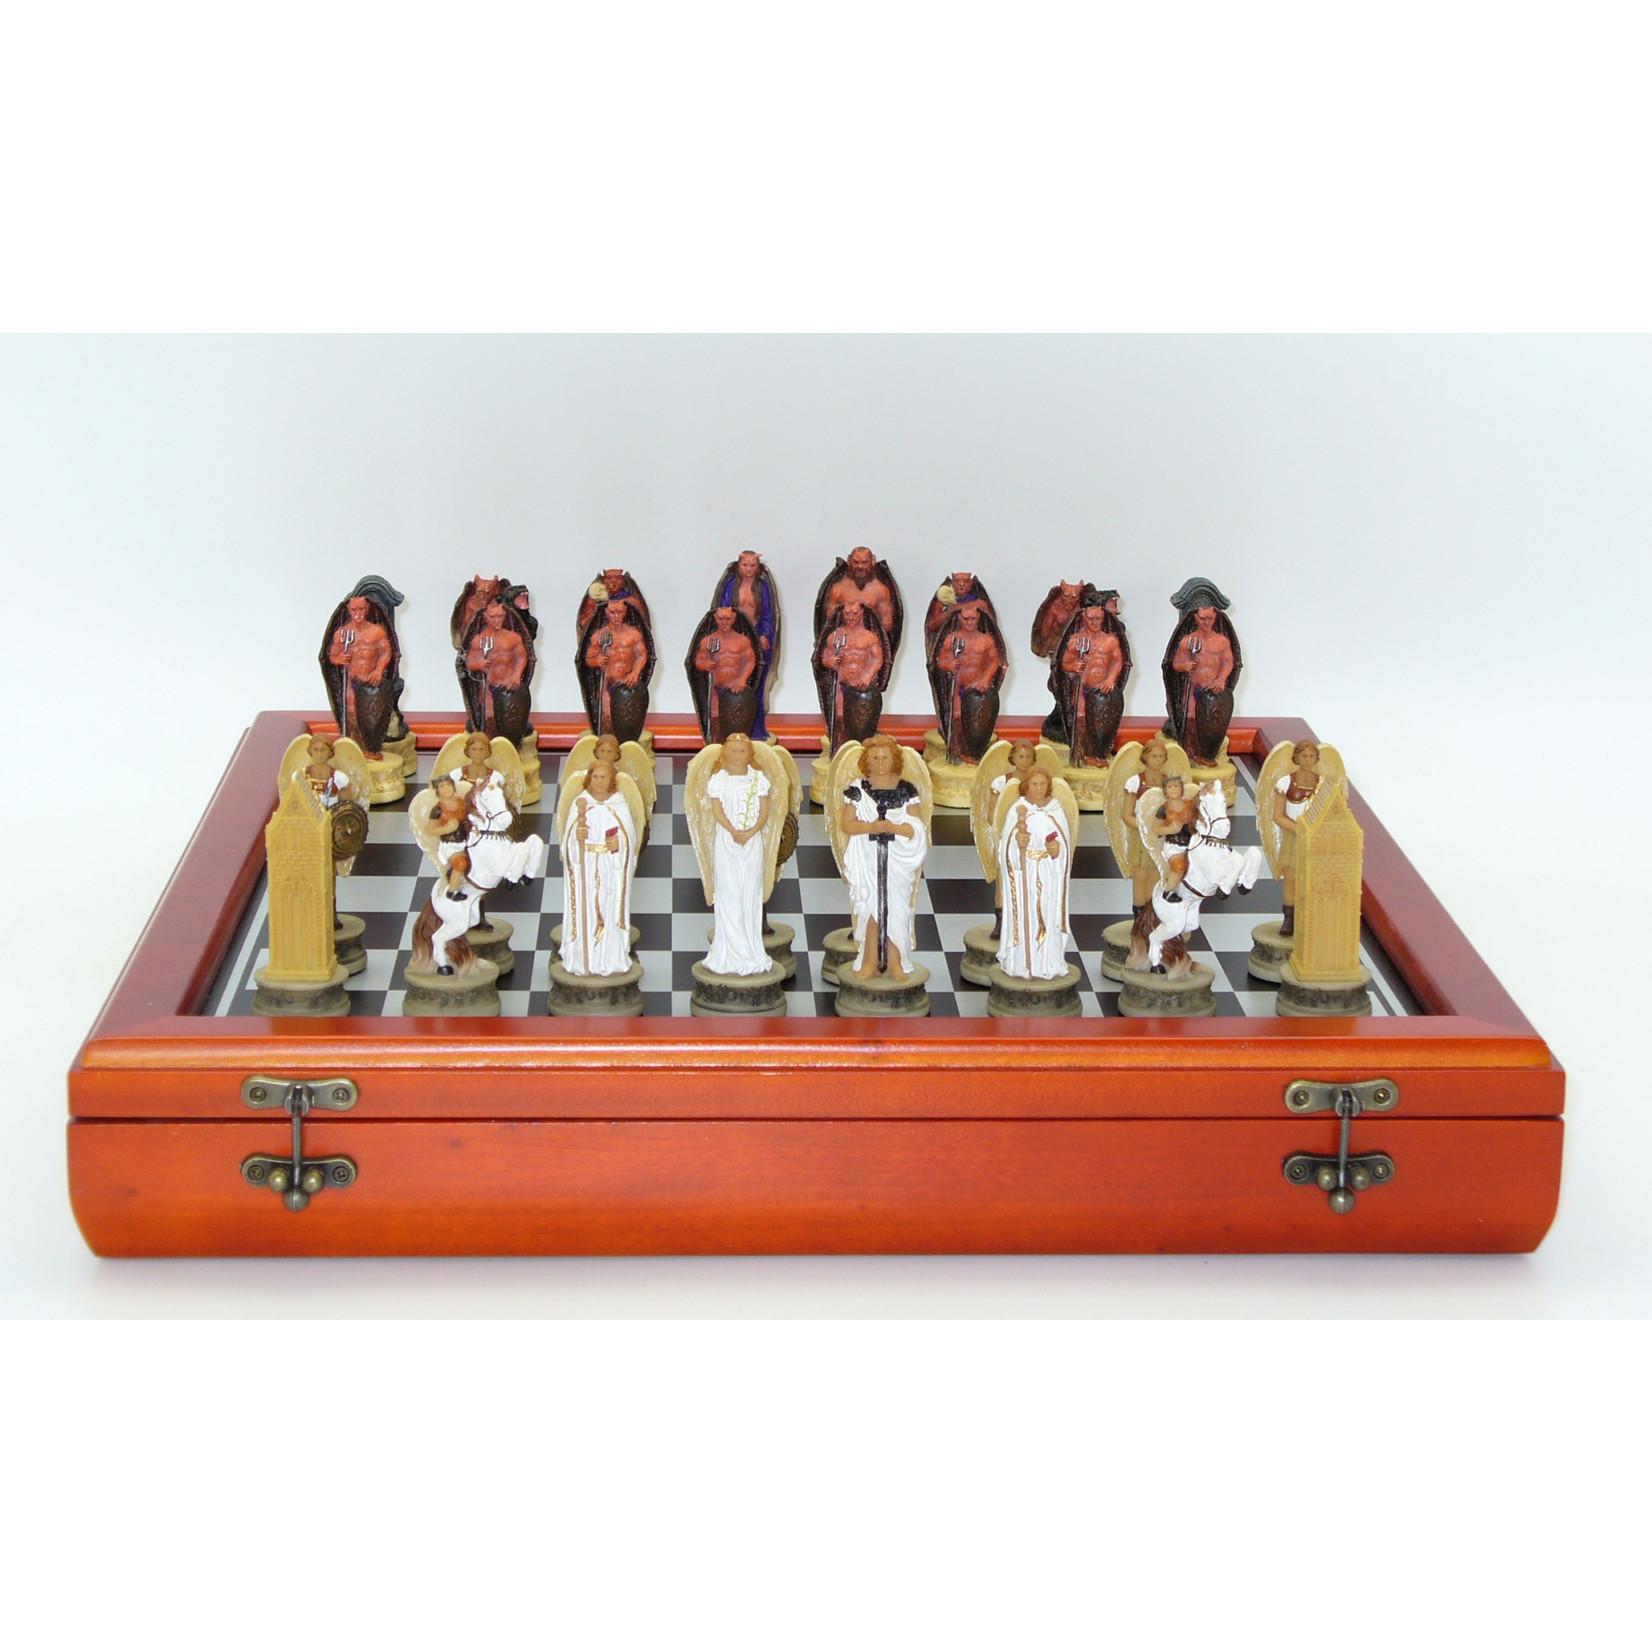 WorldWise Imports White Angels & Dark Devils Resin Chessmen on Cherry Stained Chest